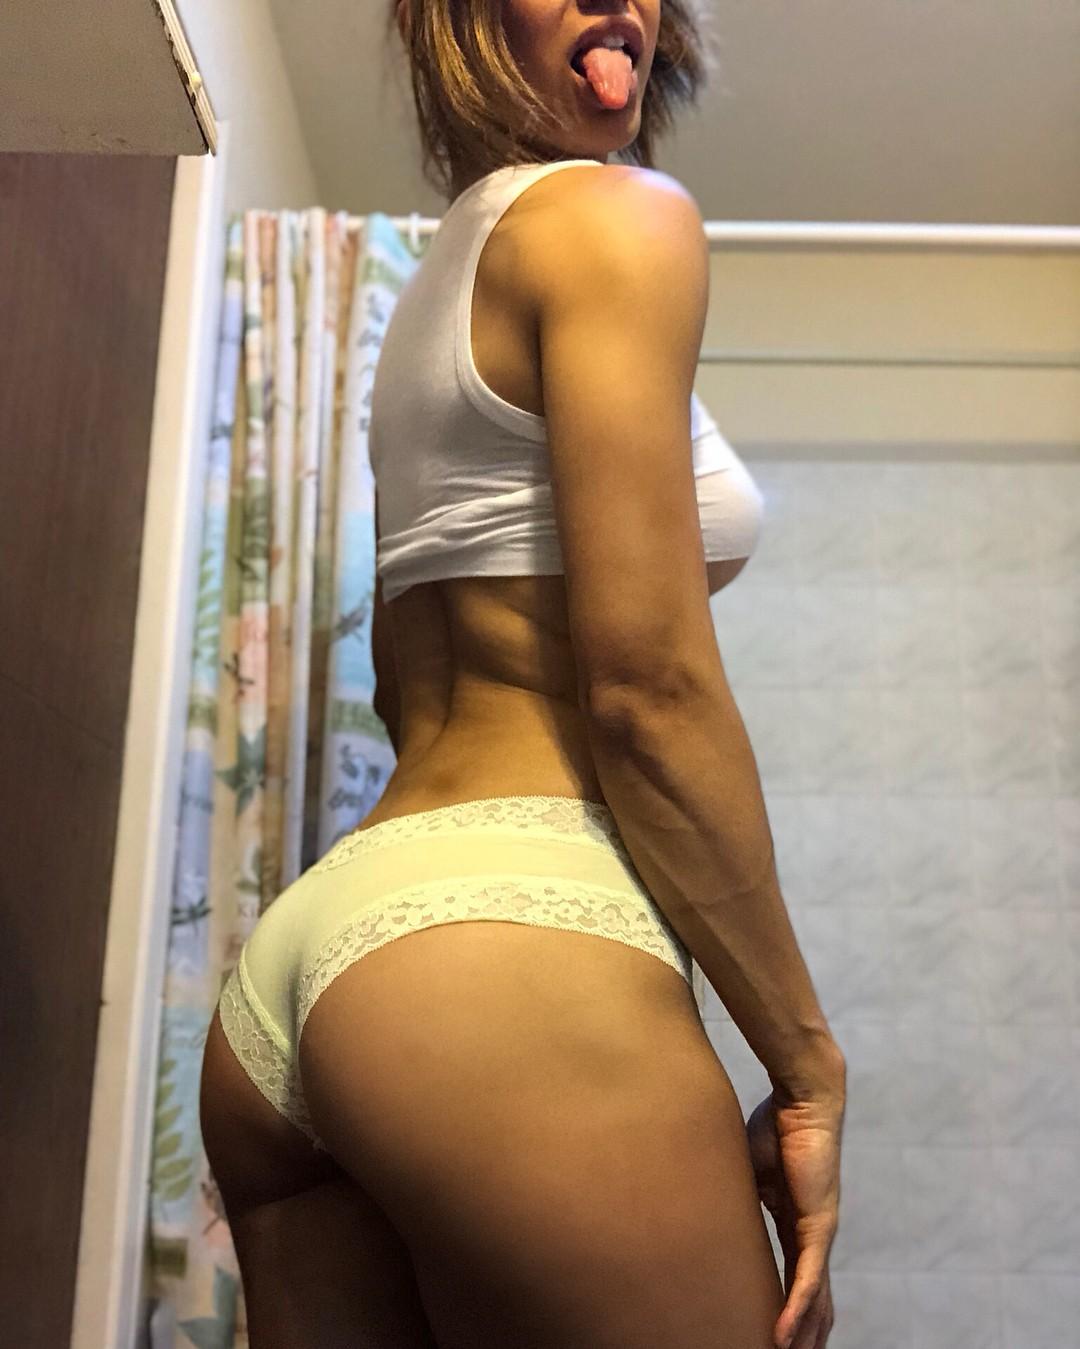 Kayli-Ann-Phillips-Nude-Sexy-The-Fappening-Pro-31.jpg